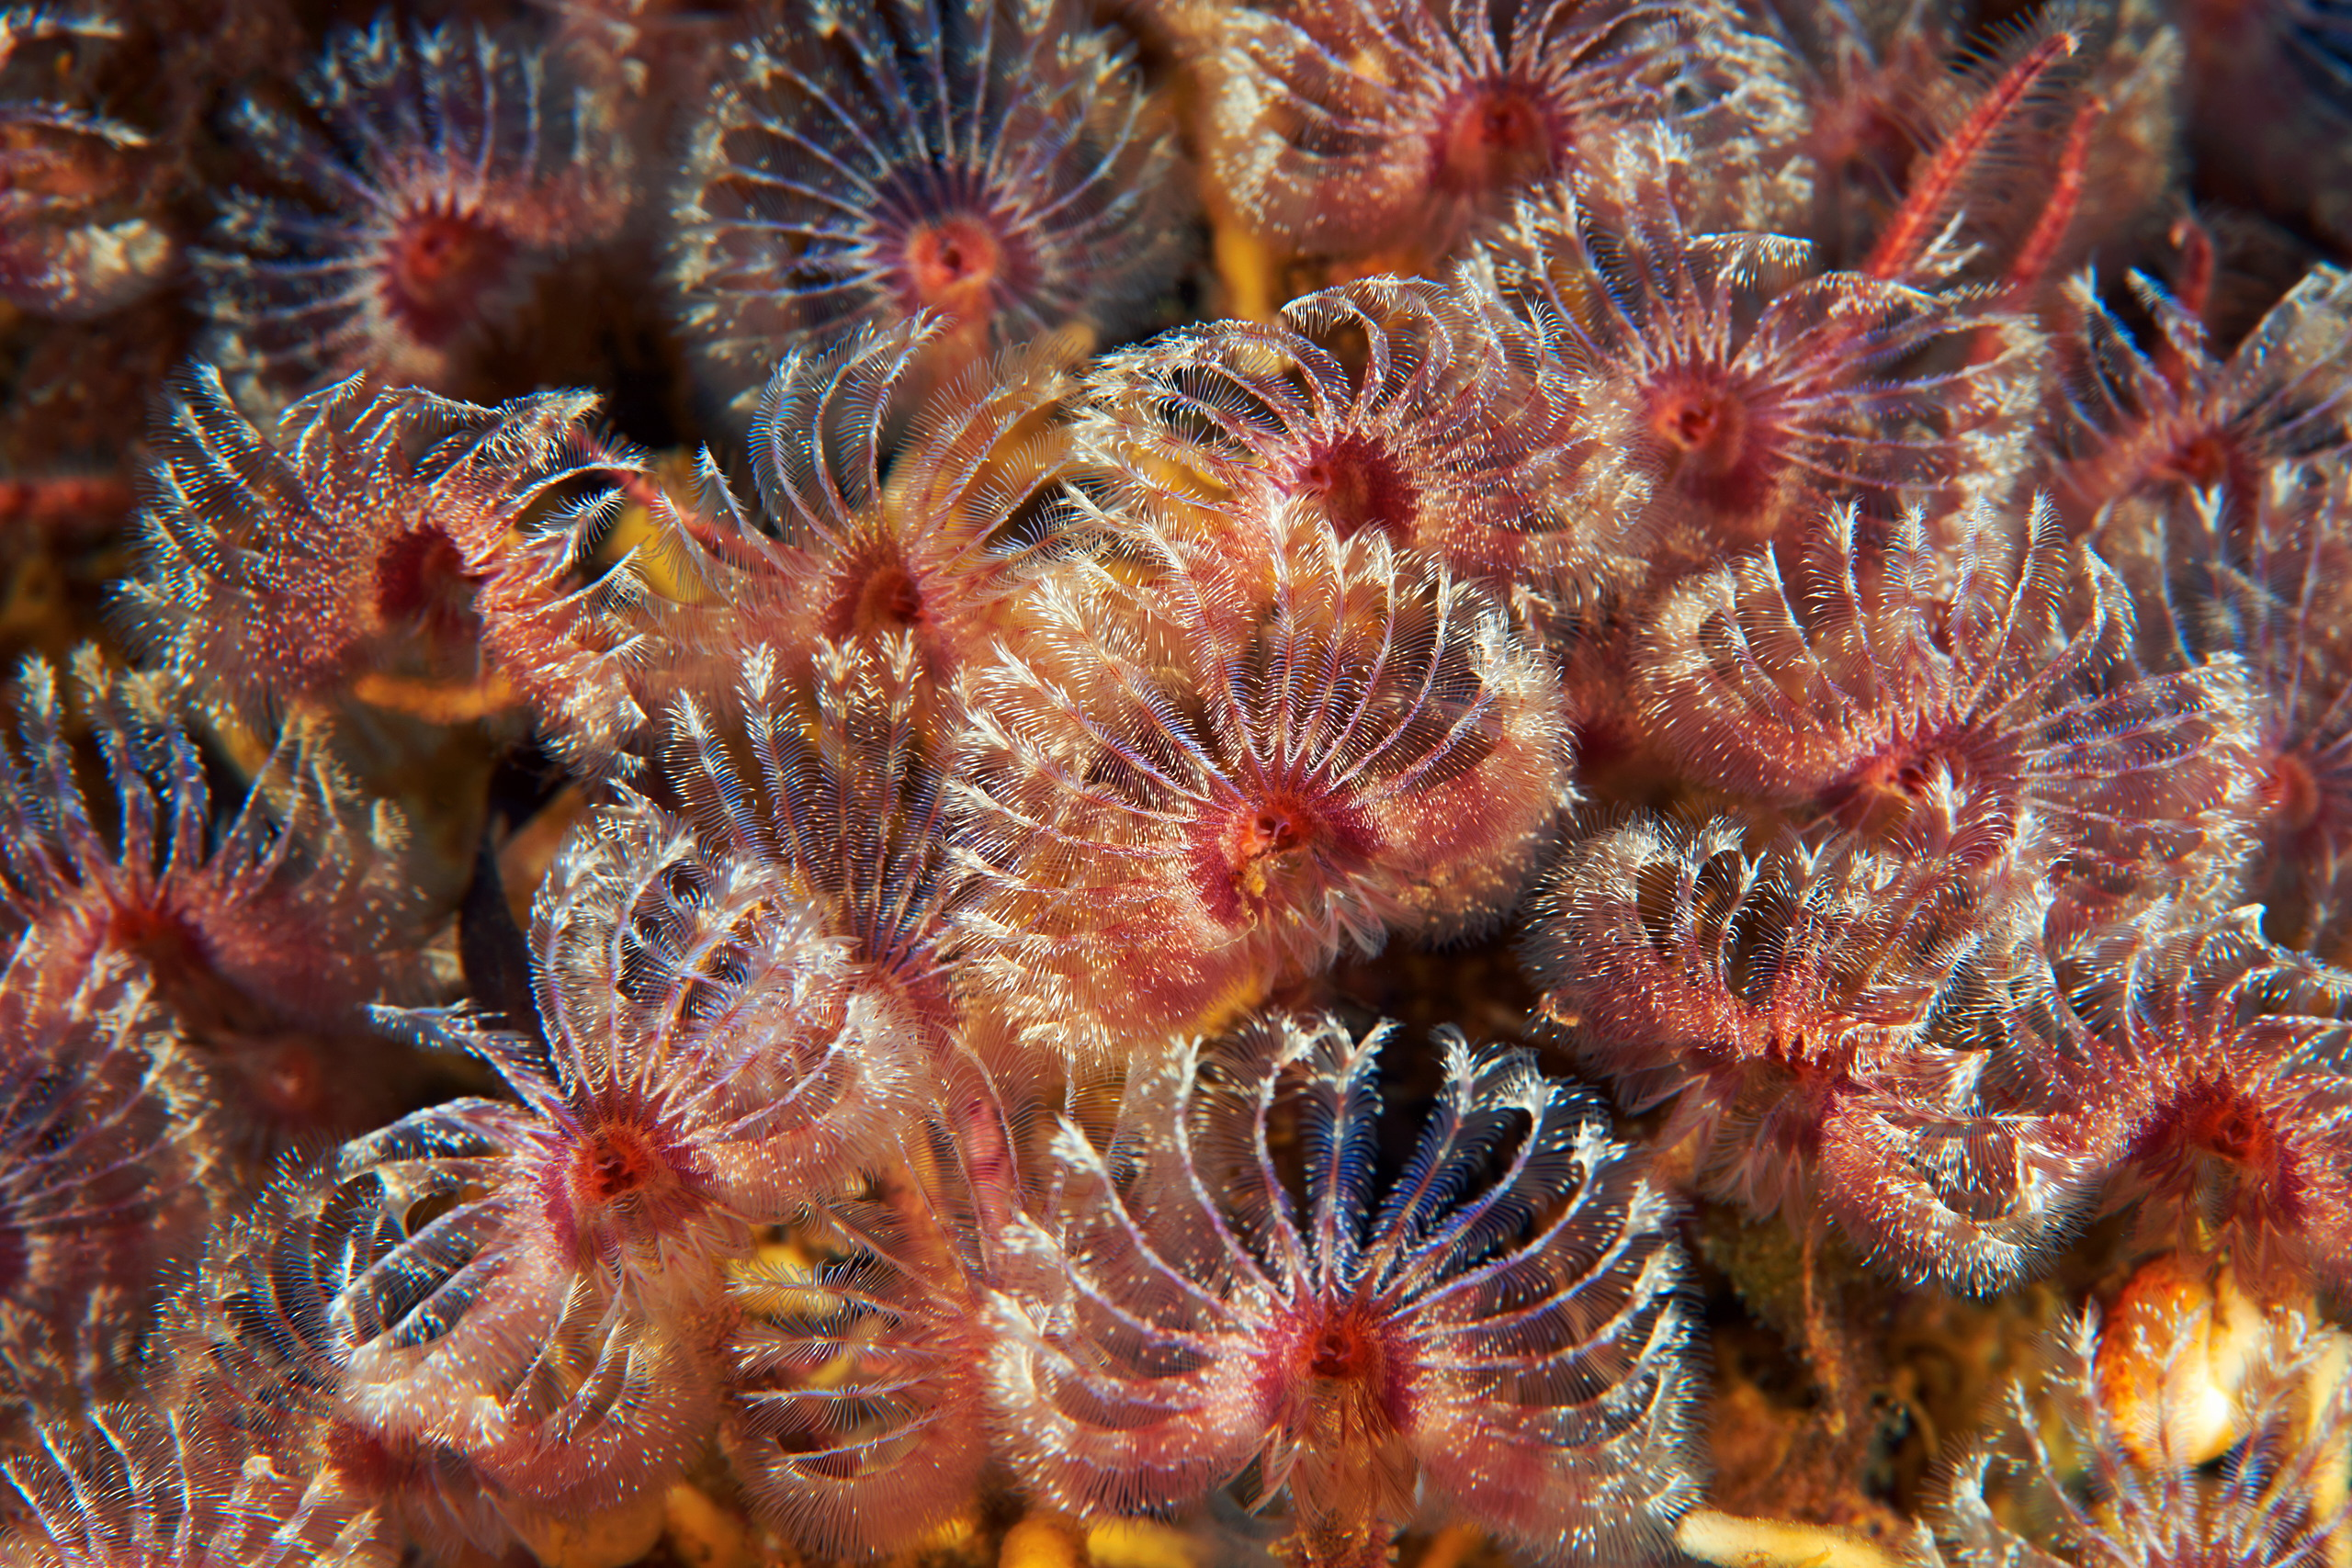 Polychaete tube worm – Pseudopotamilla reniformis 2